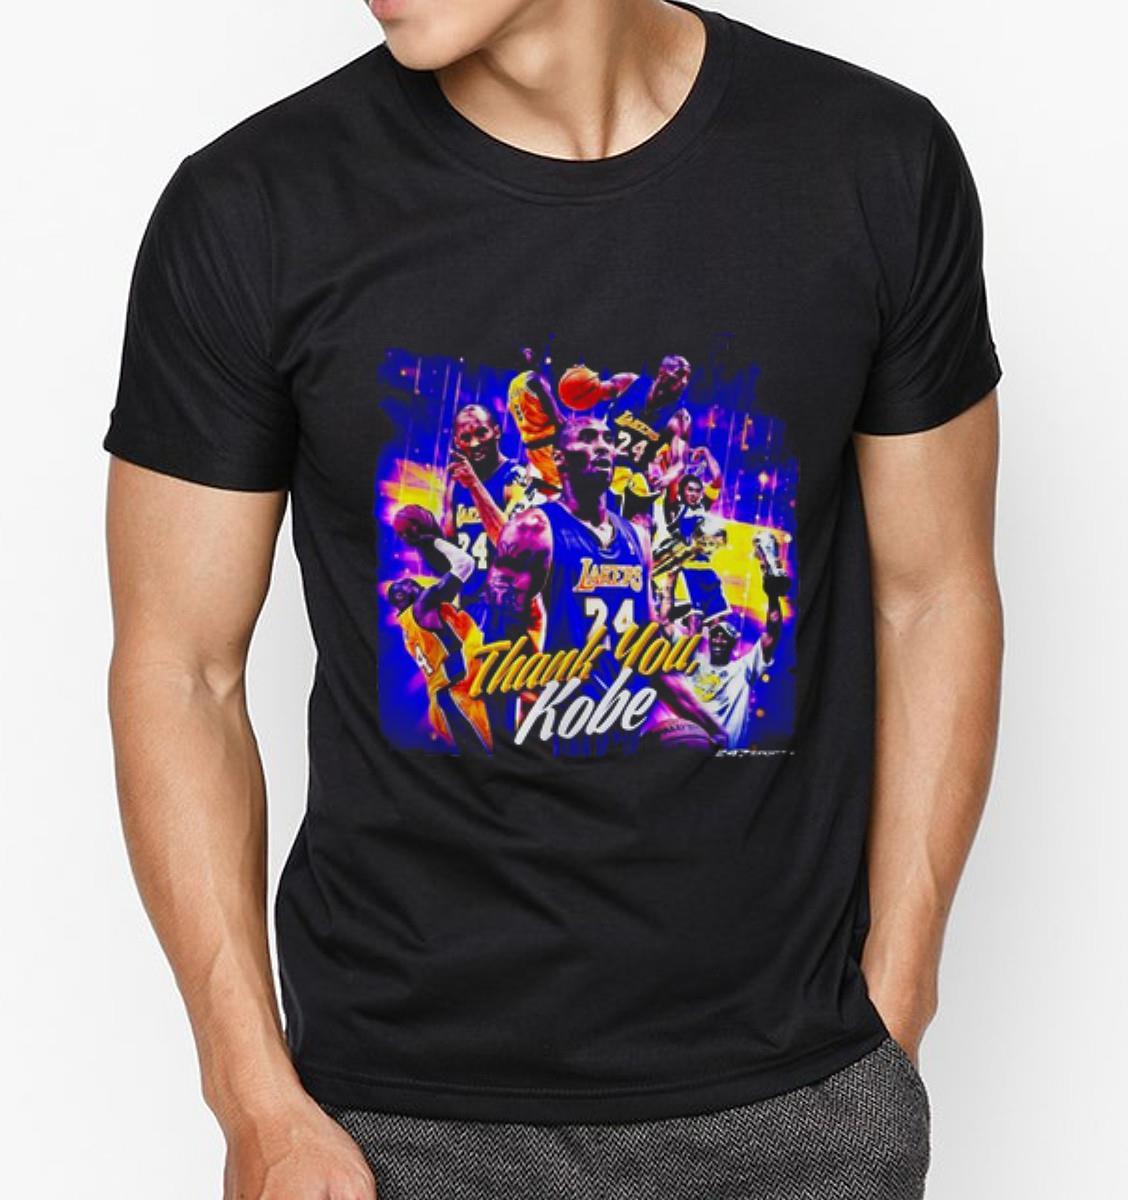 Premium Rip Lakers Thank You Kobe Shirt 3 1.jpg